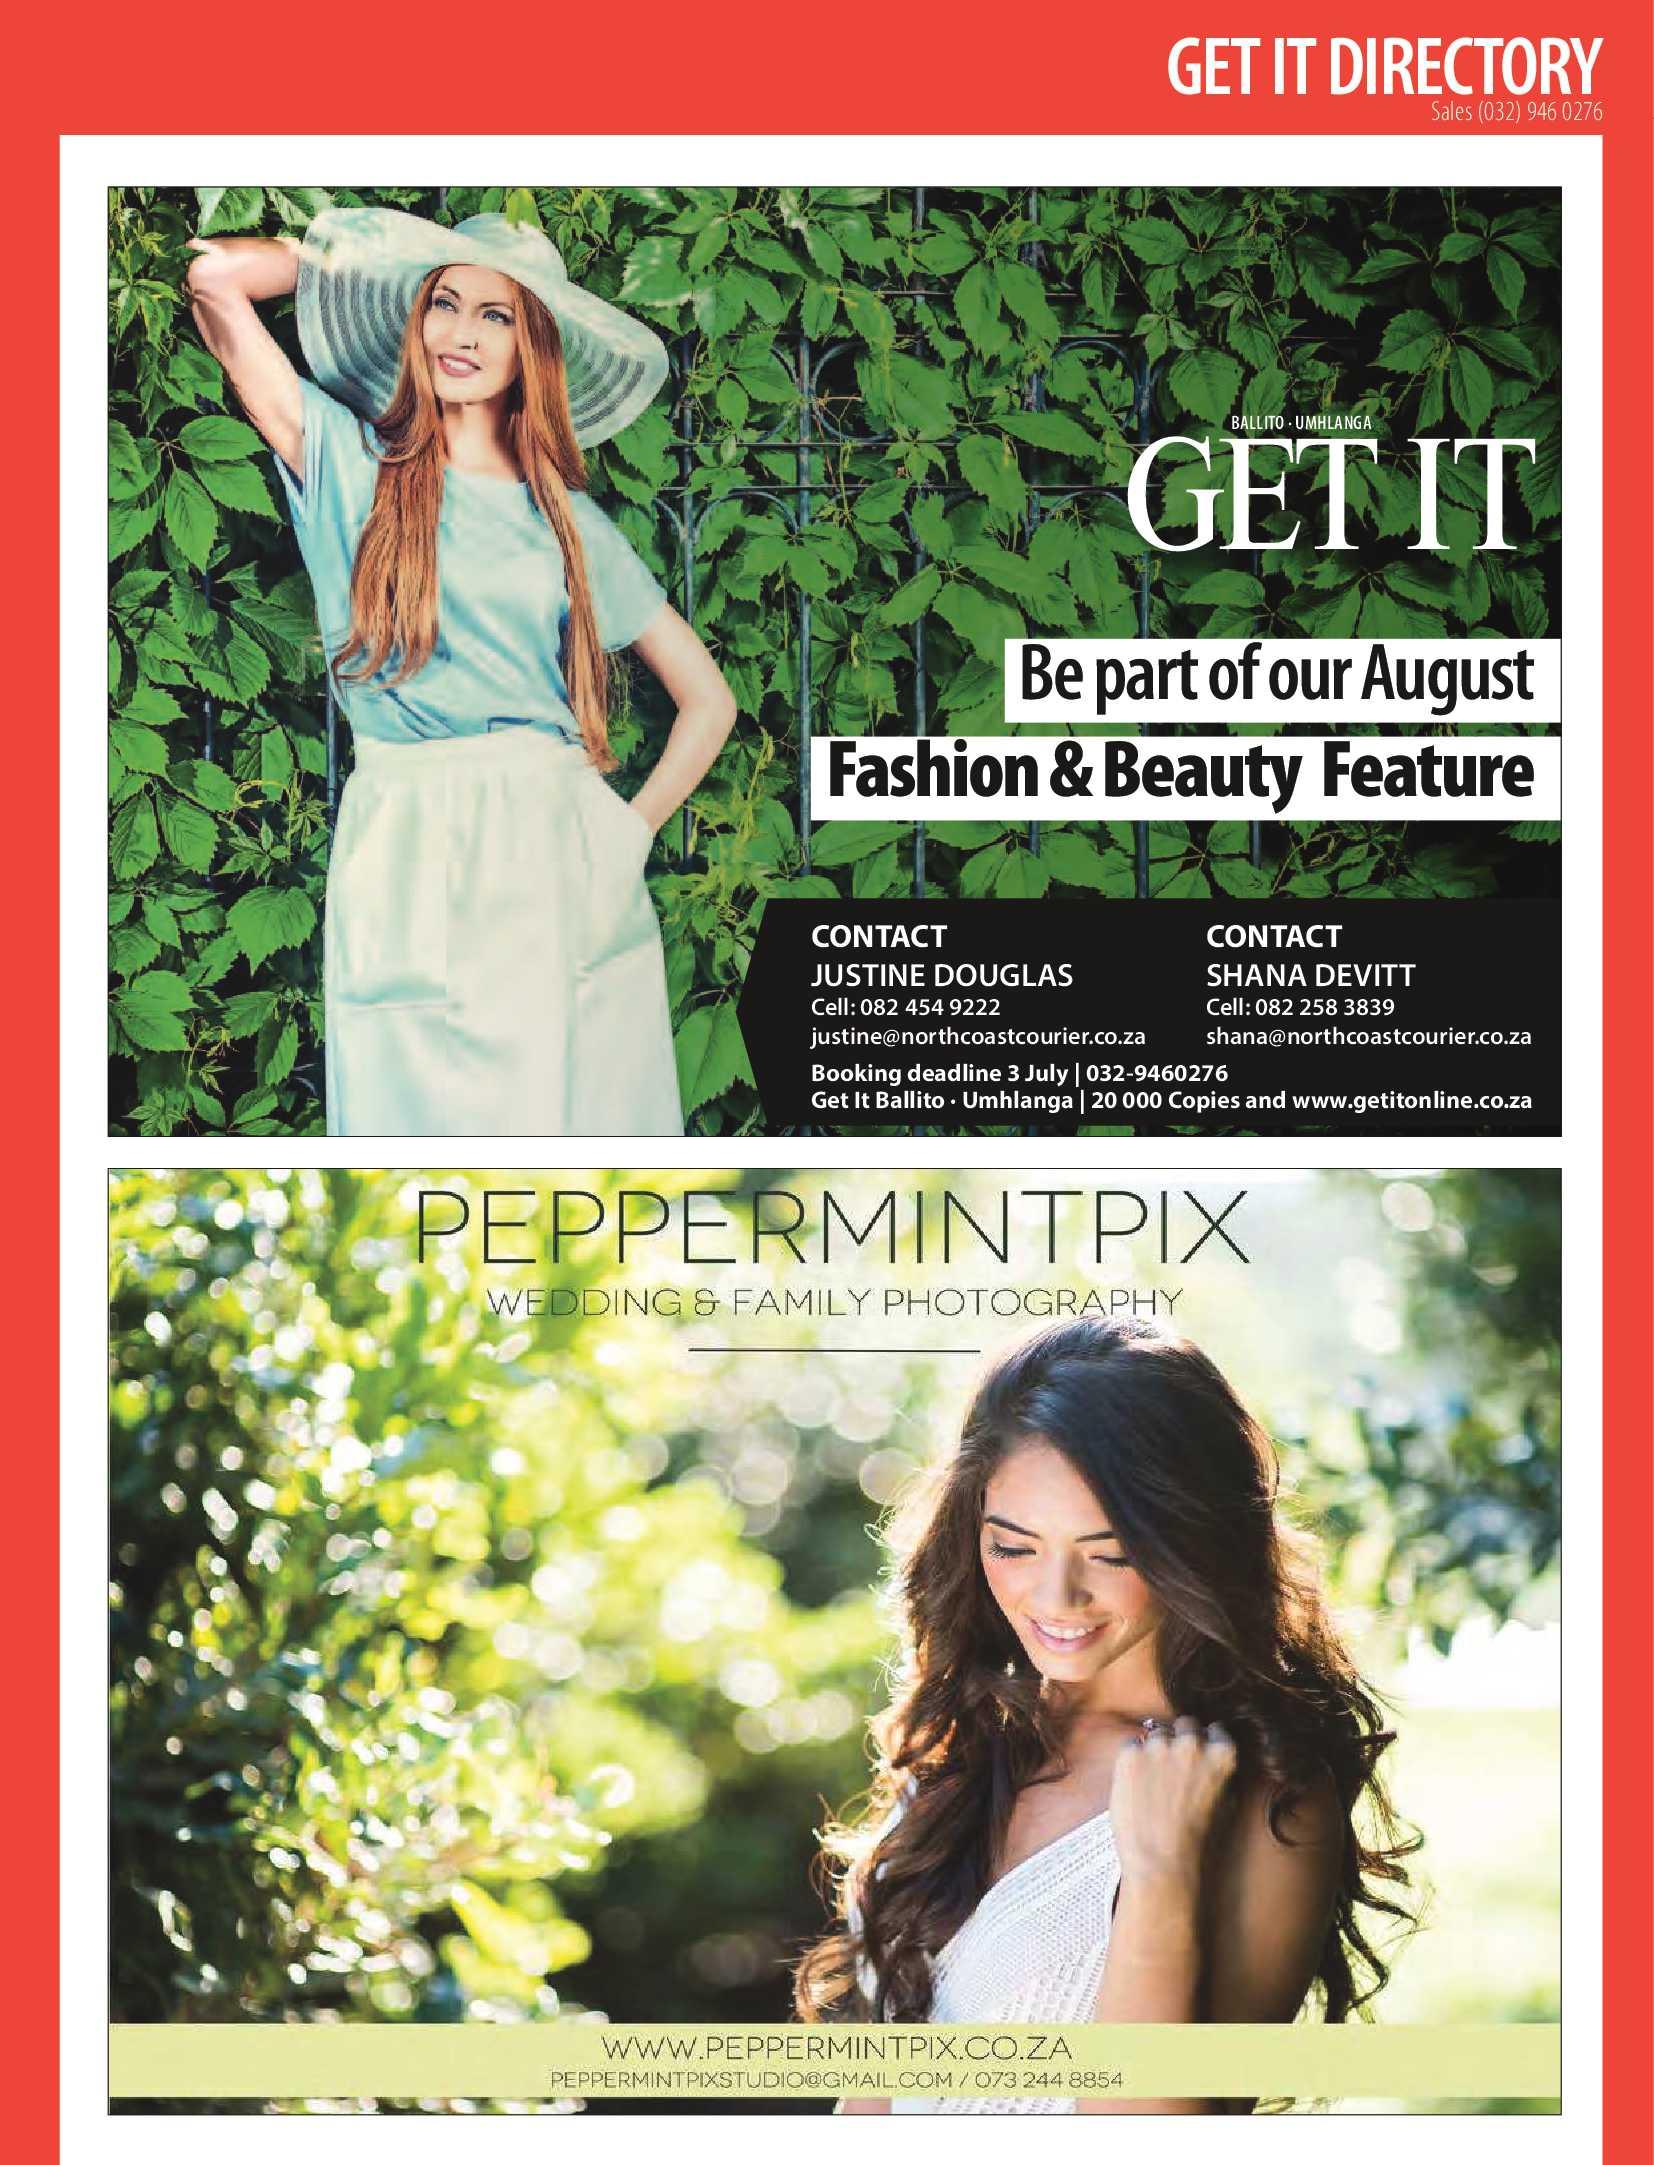 get-magazine-ballitoumhlanga-july-2017-2-epapers-page-61